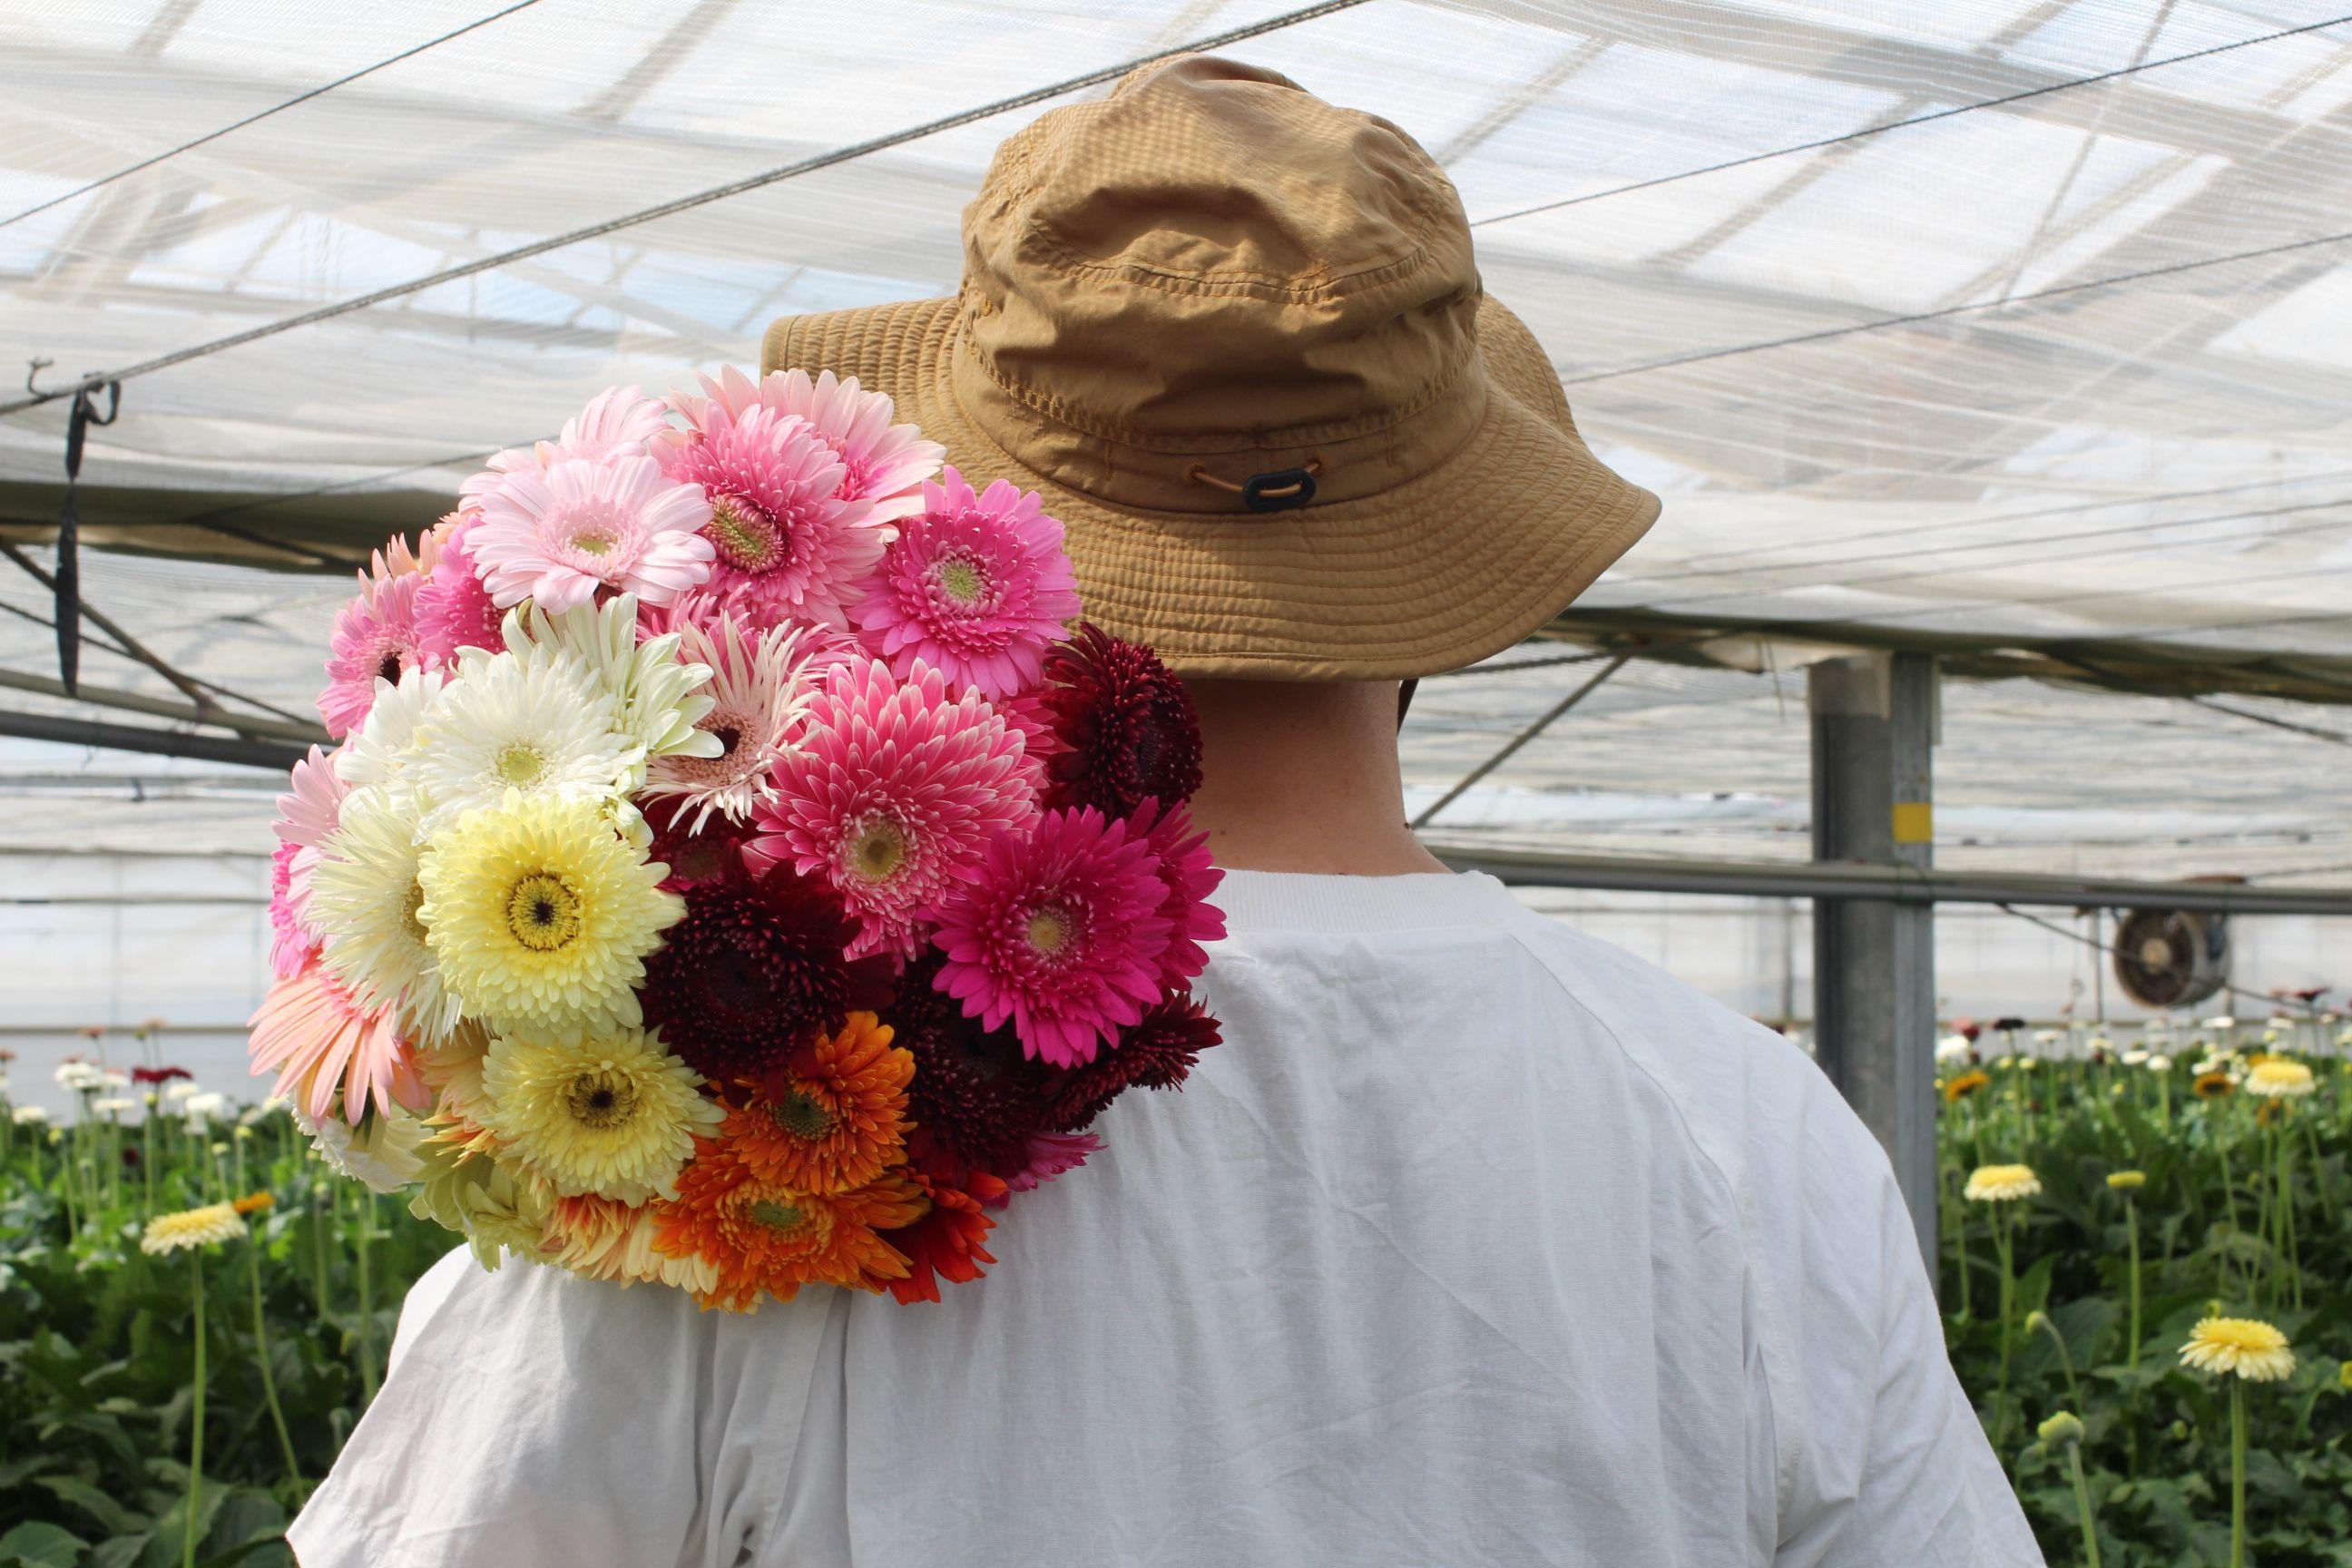 ADORE FLOWCAが発信するガーベラの魅力 先駆けて花開く前の蕾のガーベラを出荷したわけ